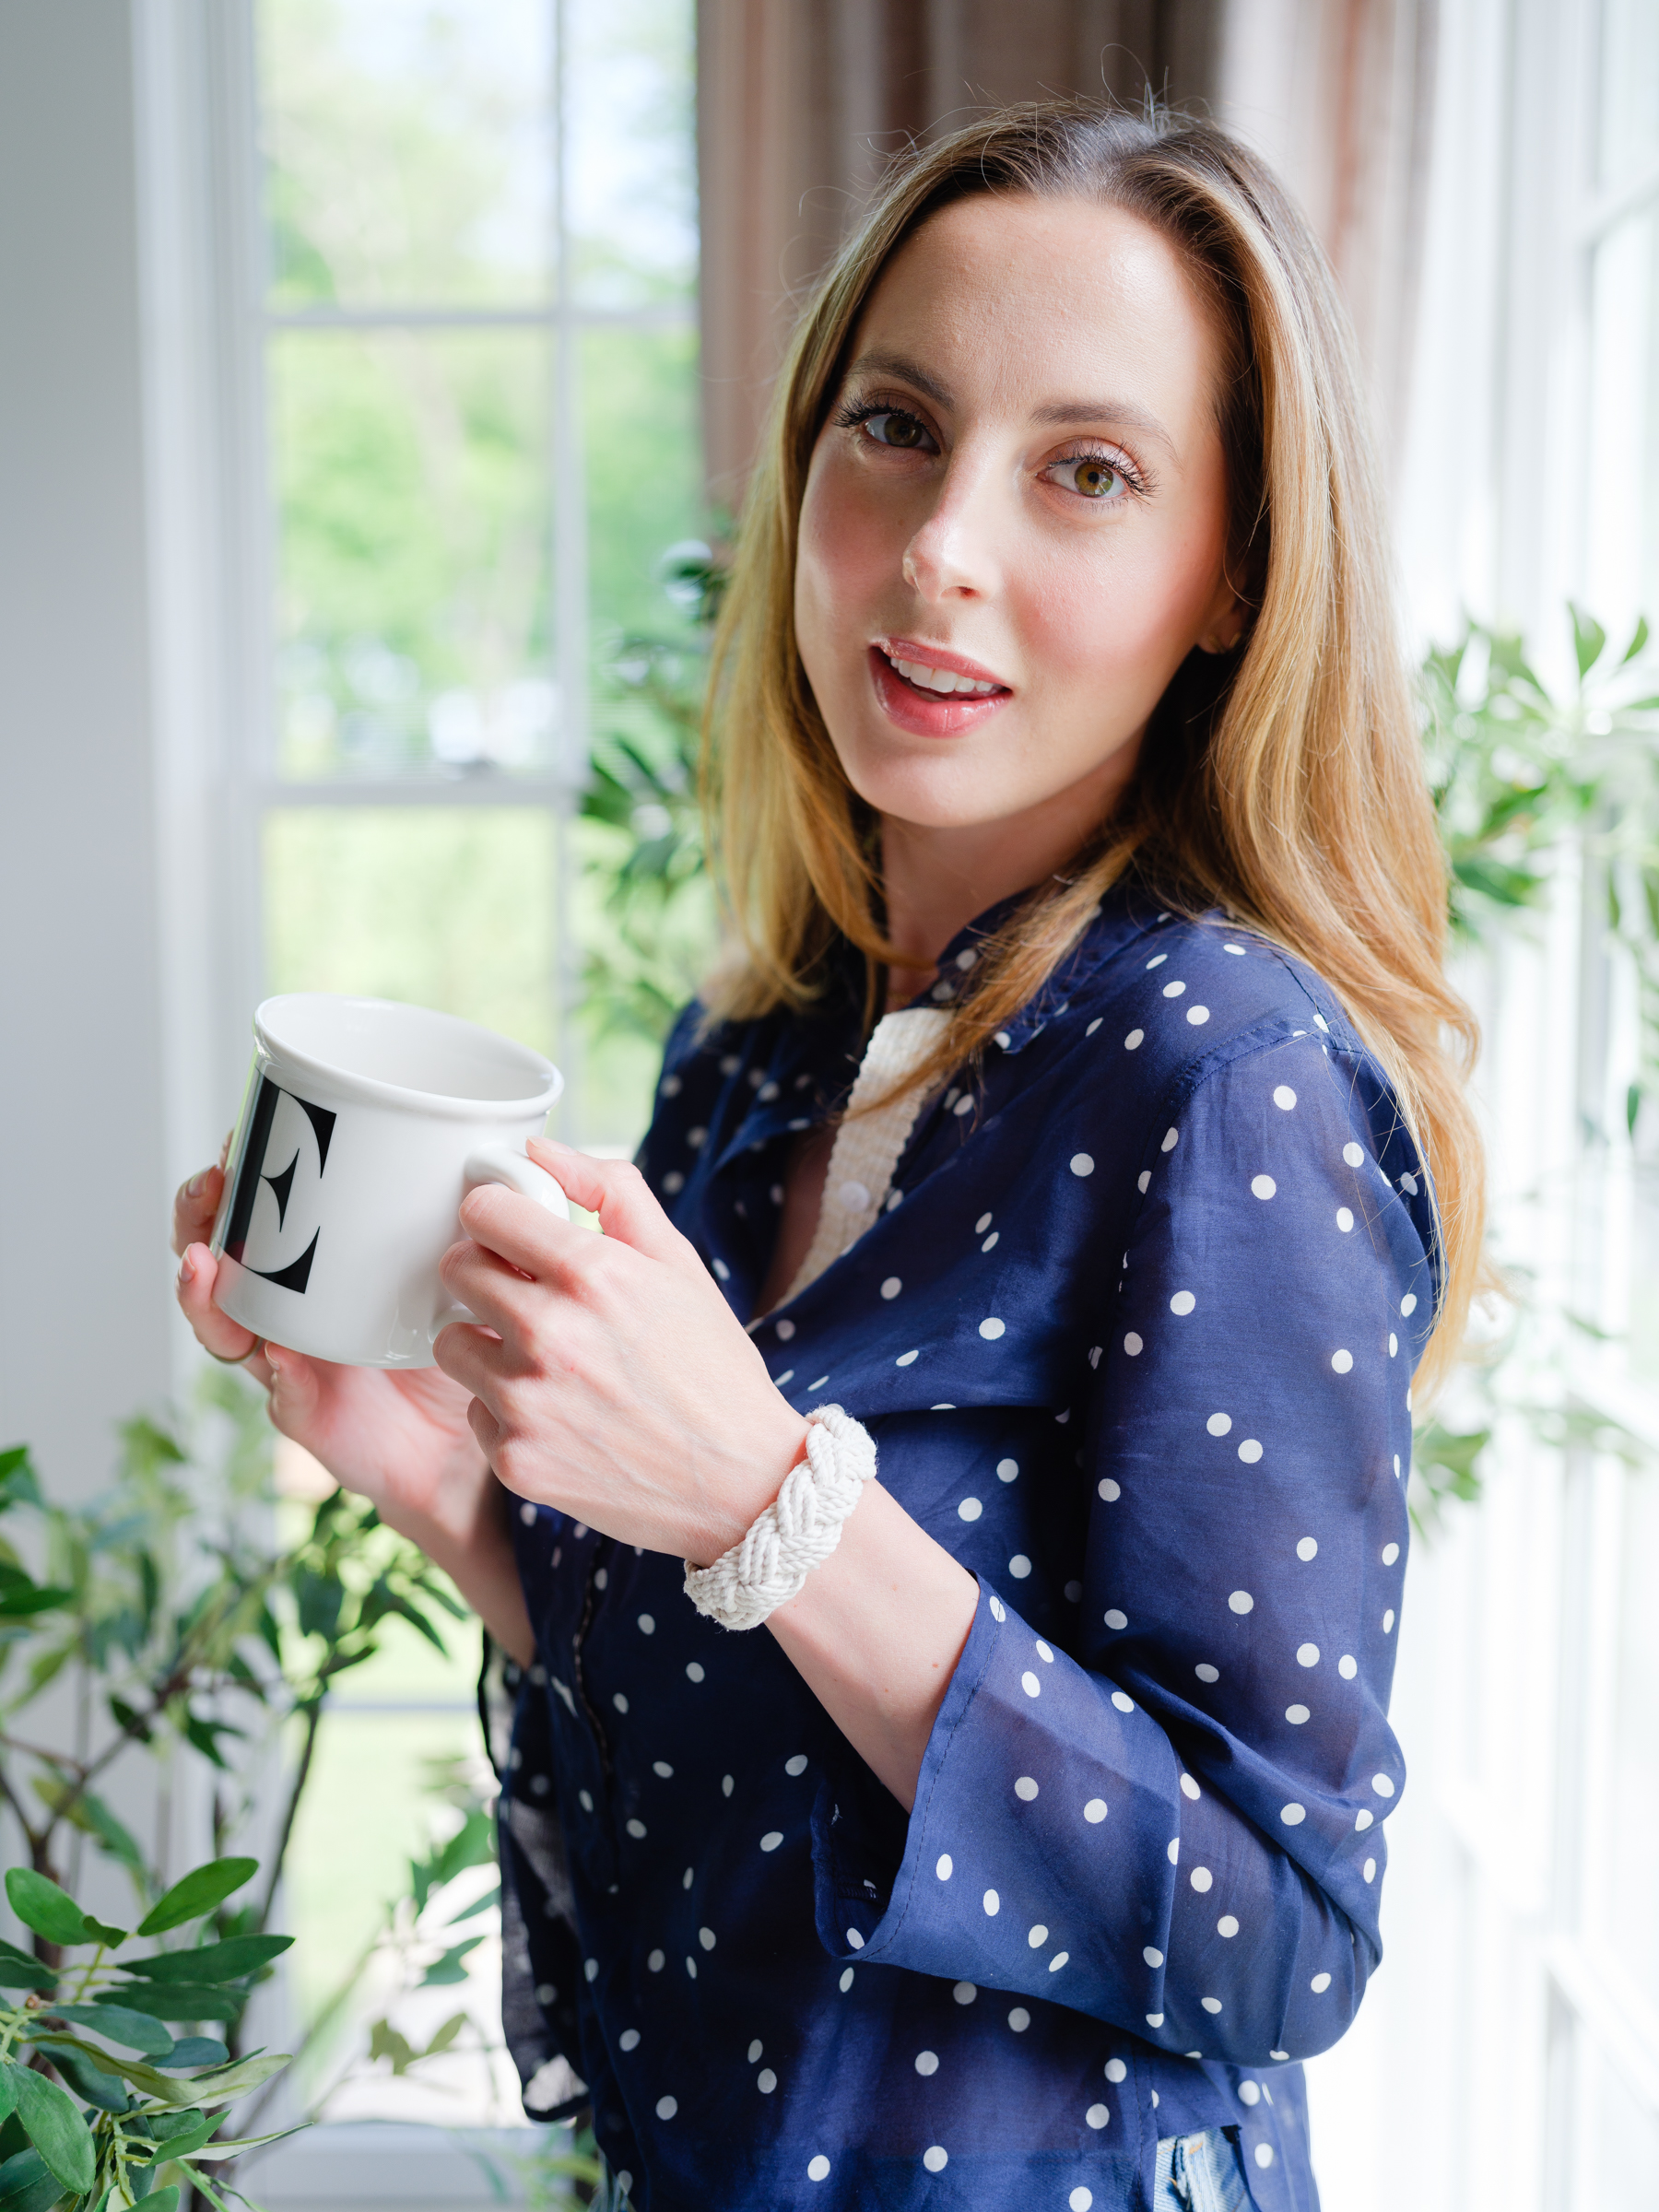 Eva Amurri shares her five minute fresh faced makeup routine